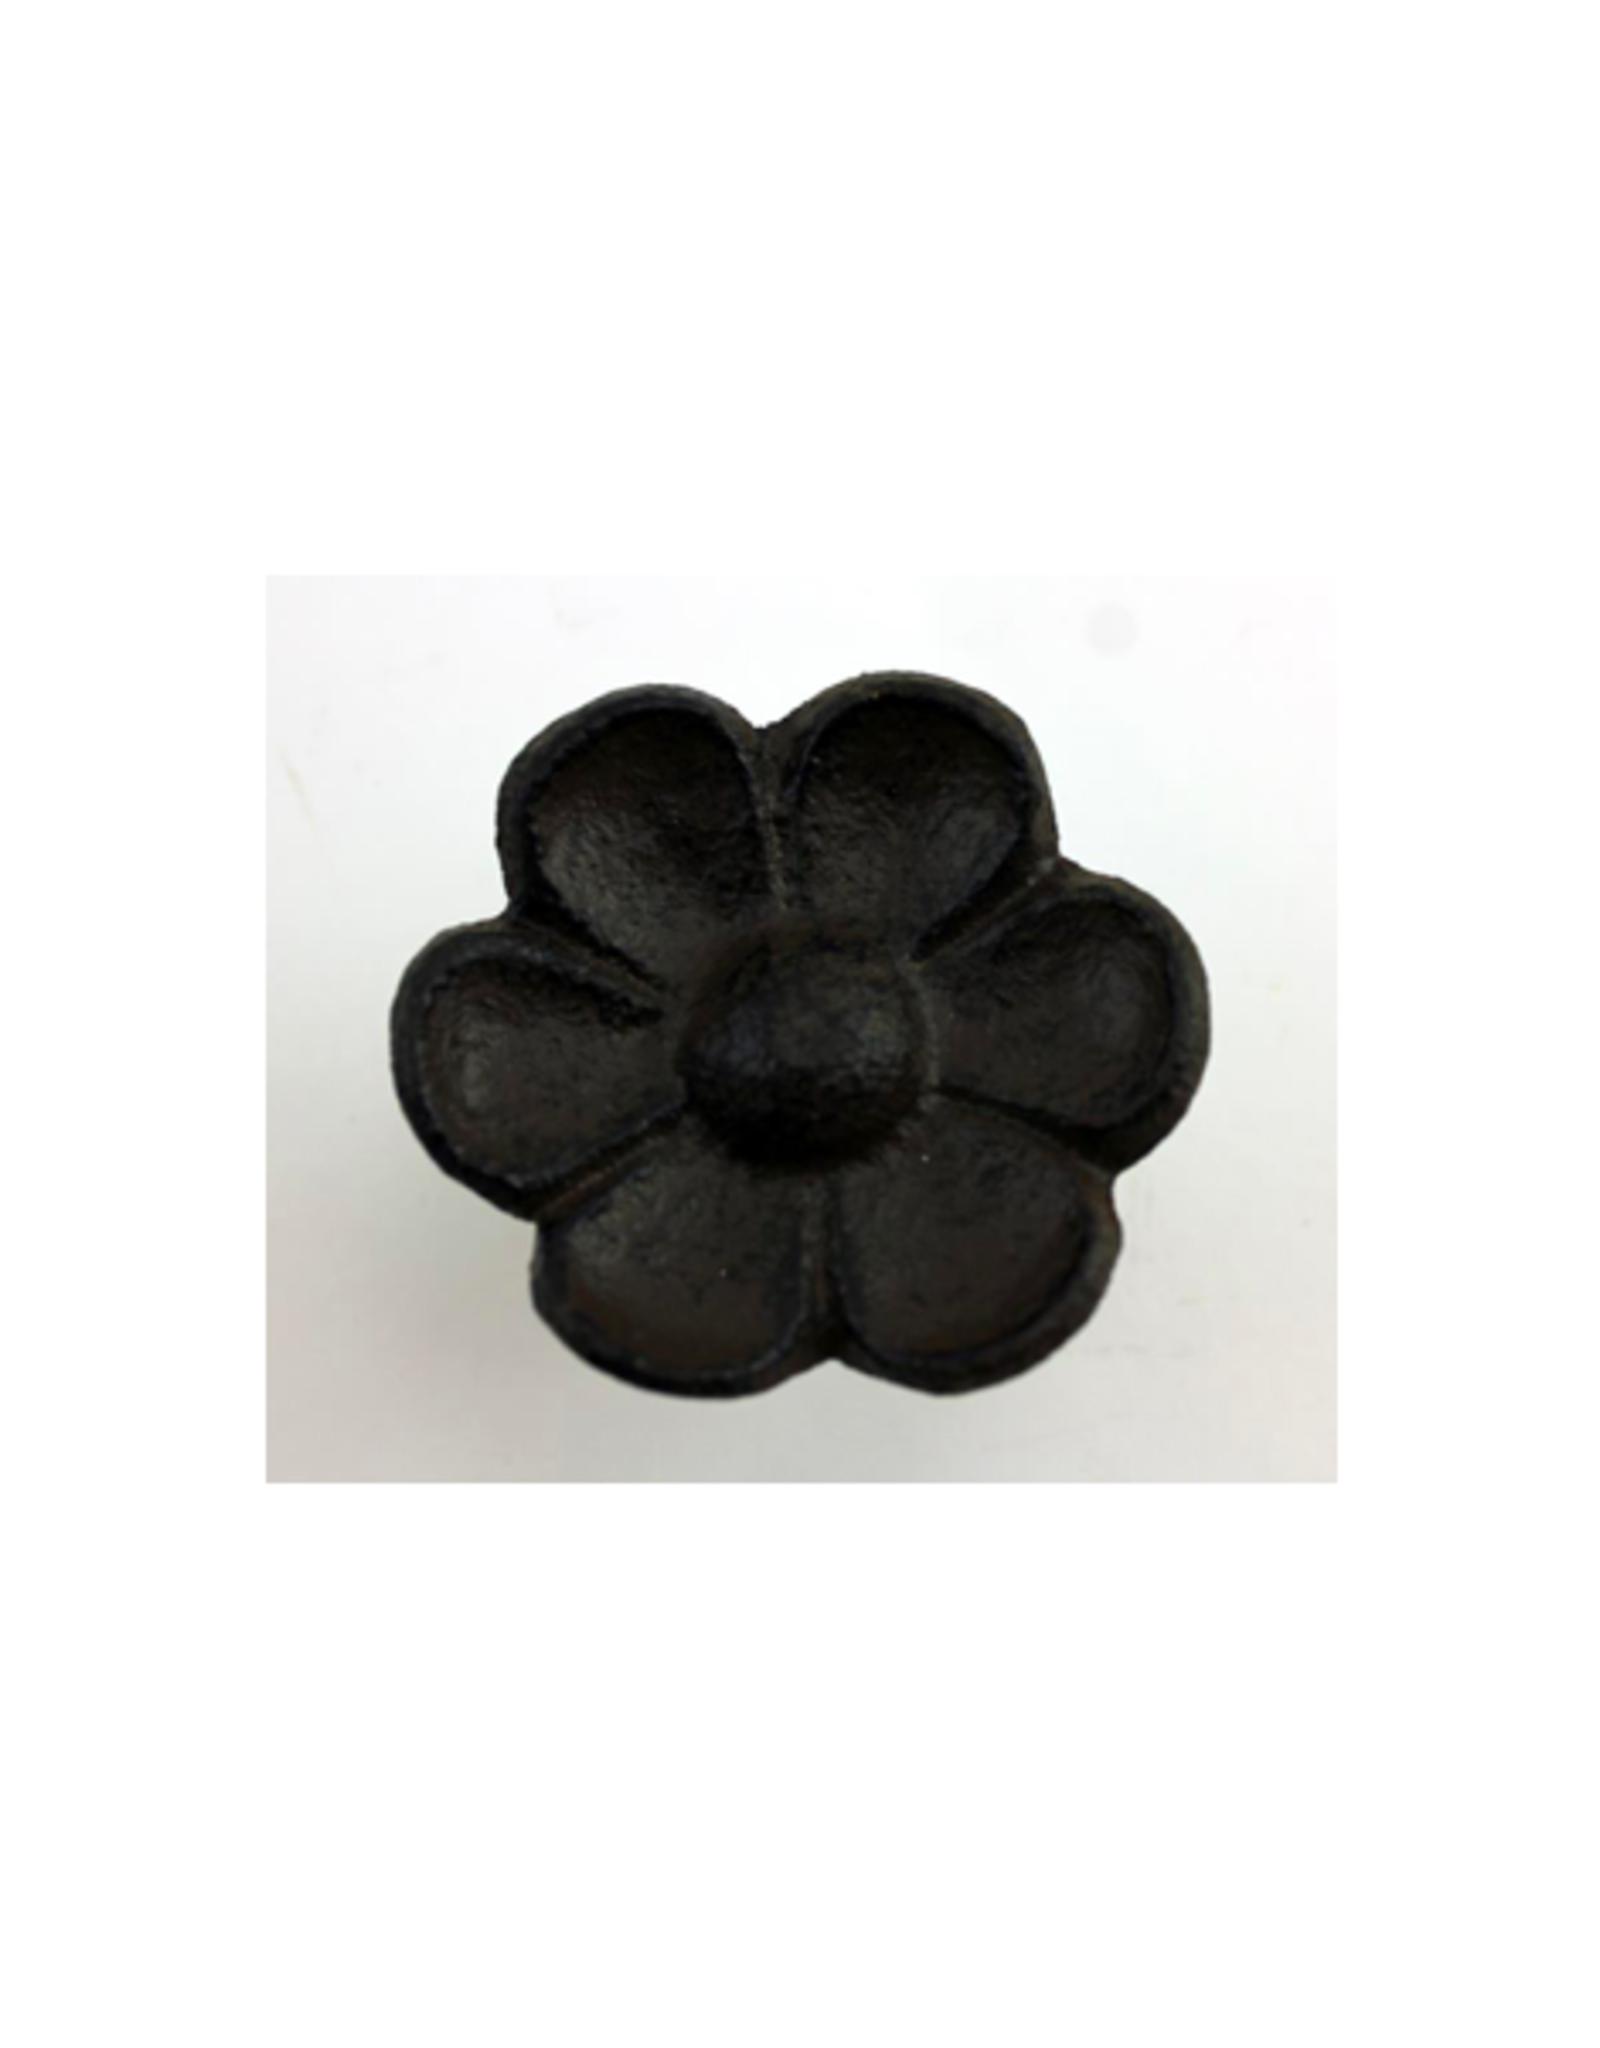 FRS - Knob / Petals, Cast Iron